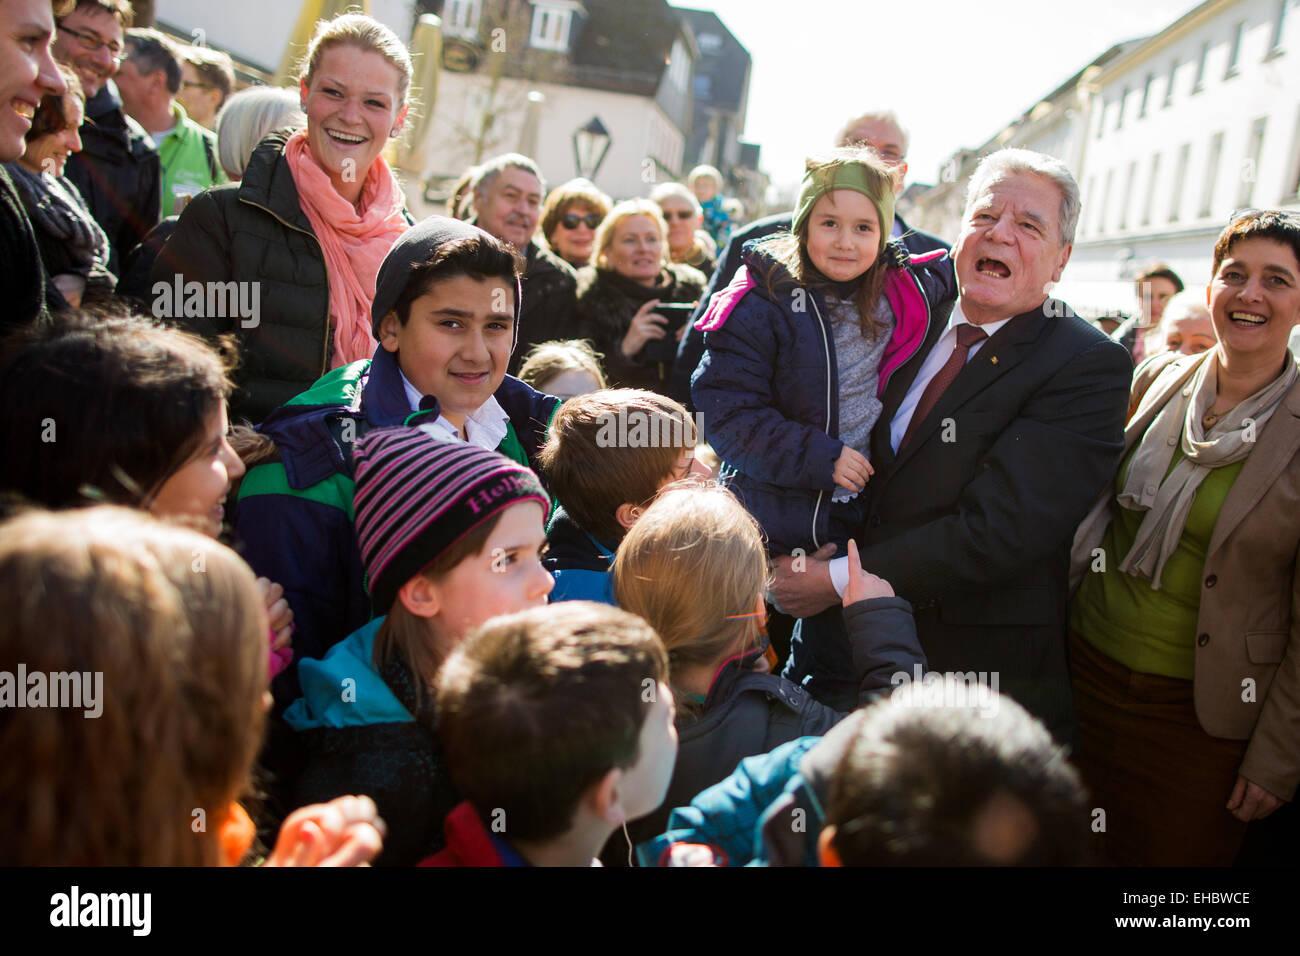 Arnsberg, Germany. 11th Mar, 2015. German President Gauck (2nd R) is accompanied by welcomed by North Rhine-Westphalia's - Stock Image